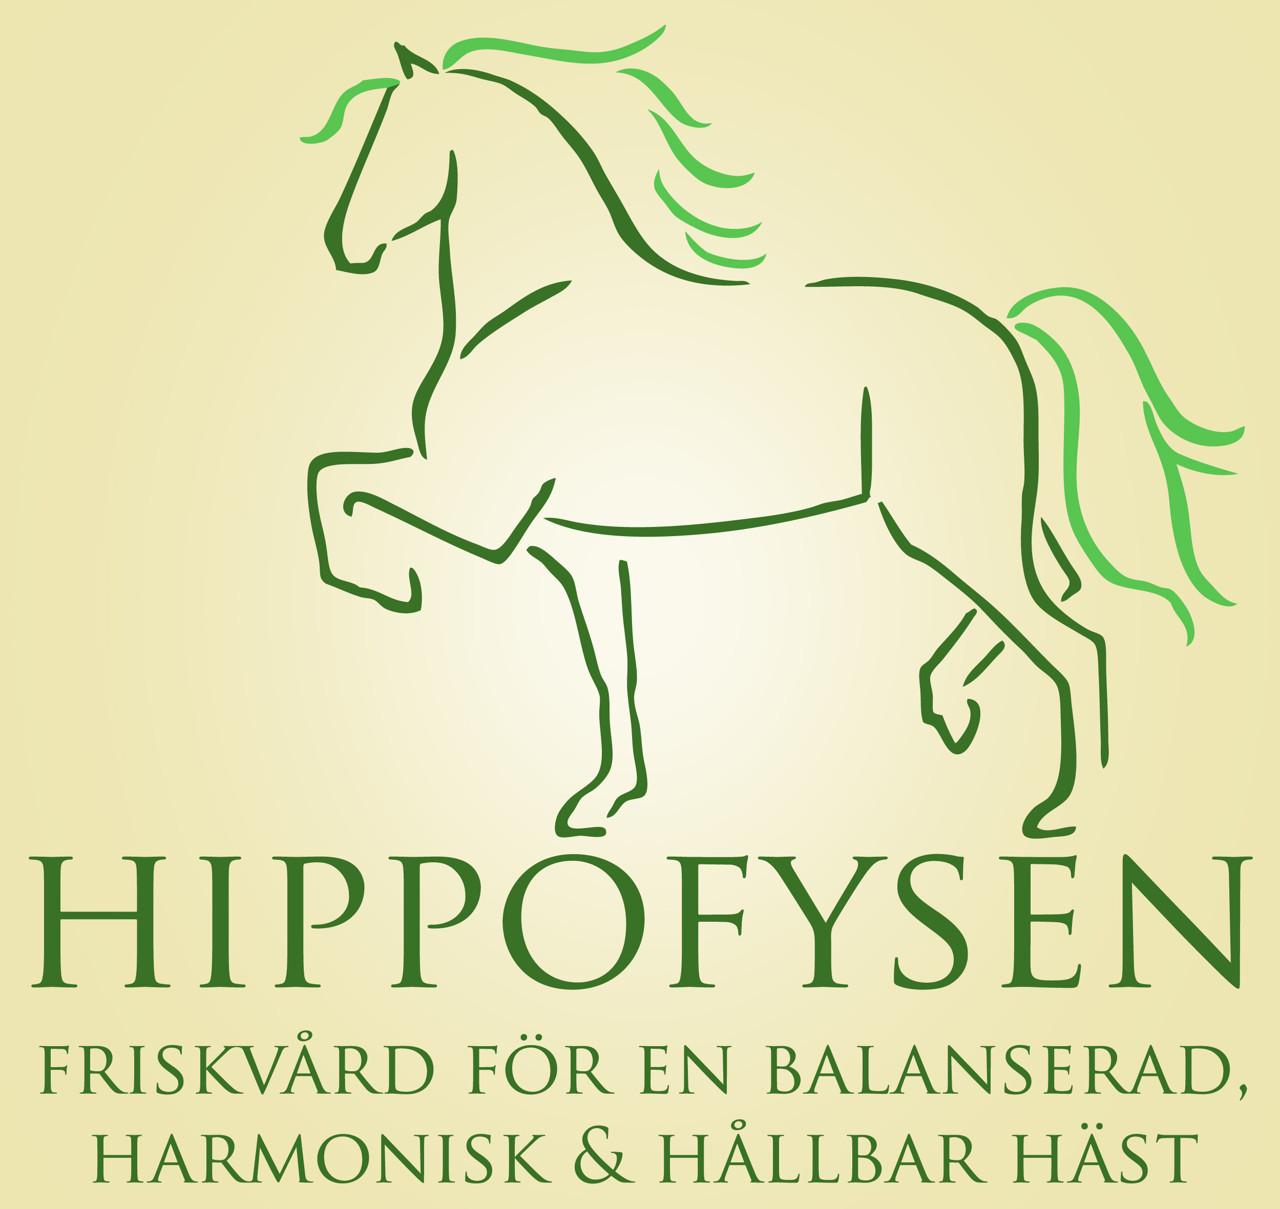 hippofysen-grön-slogan